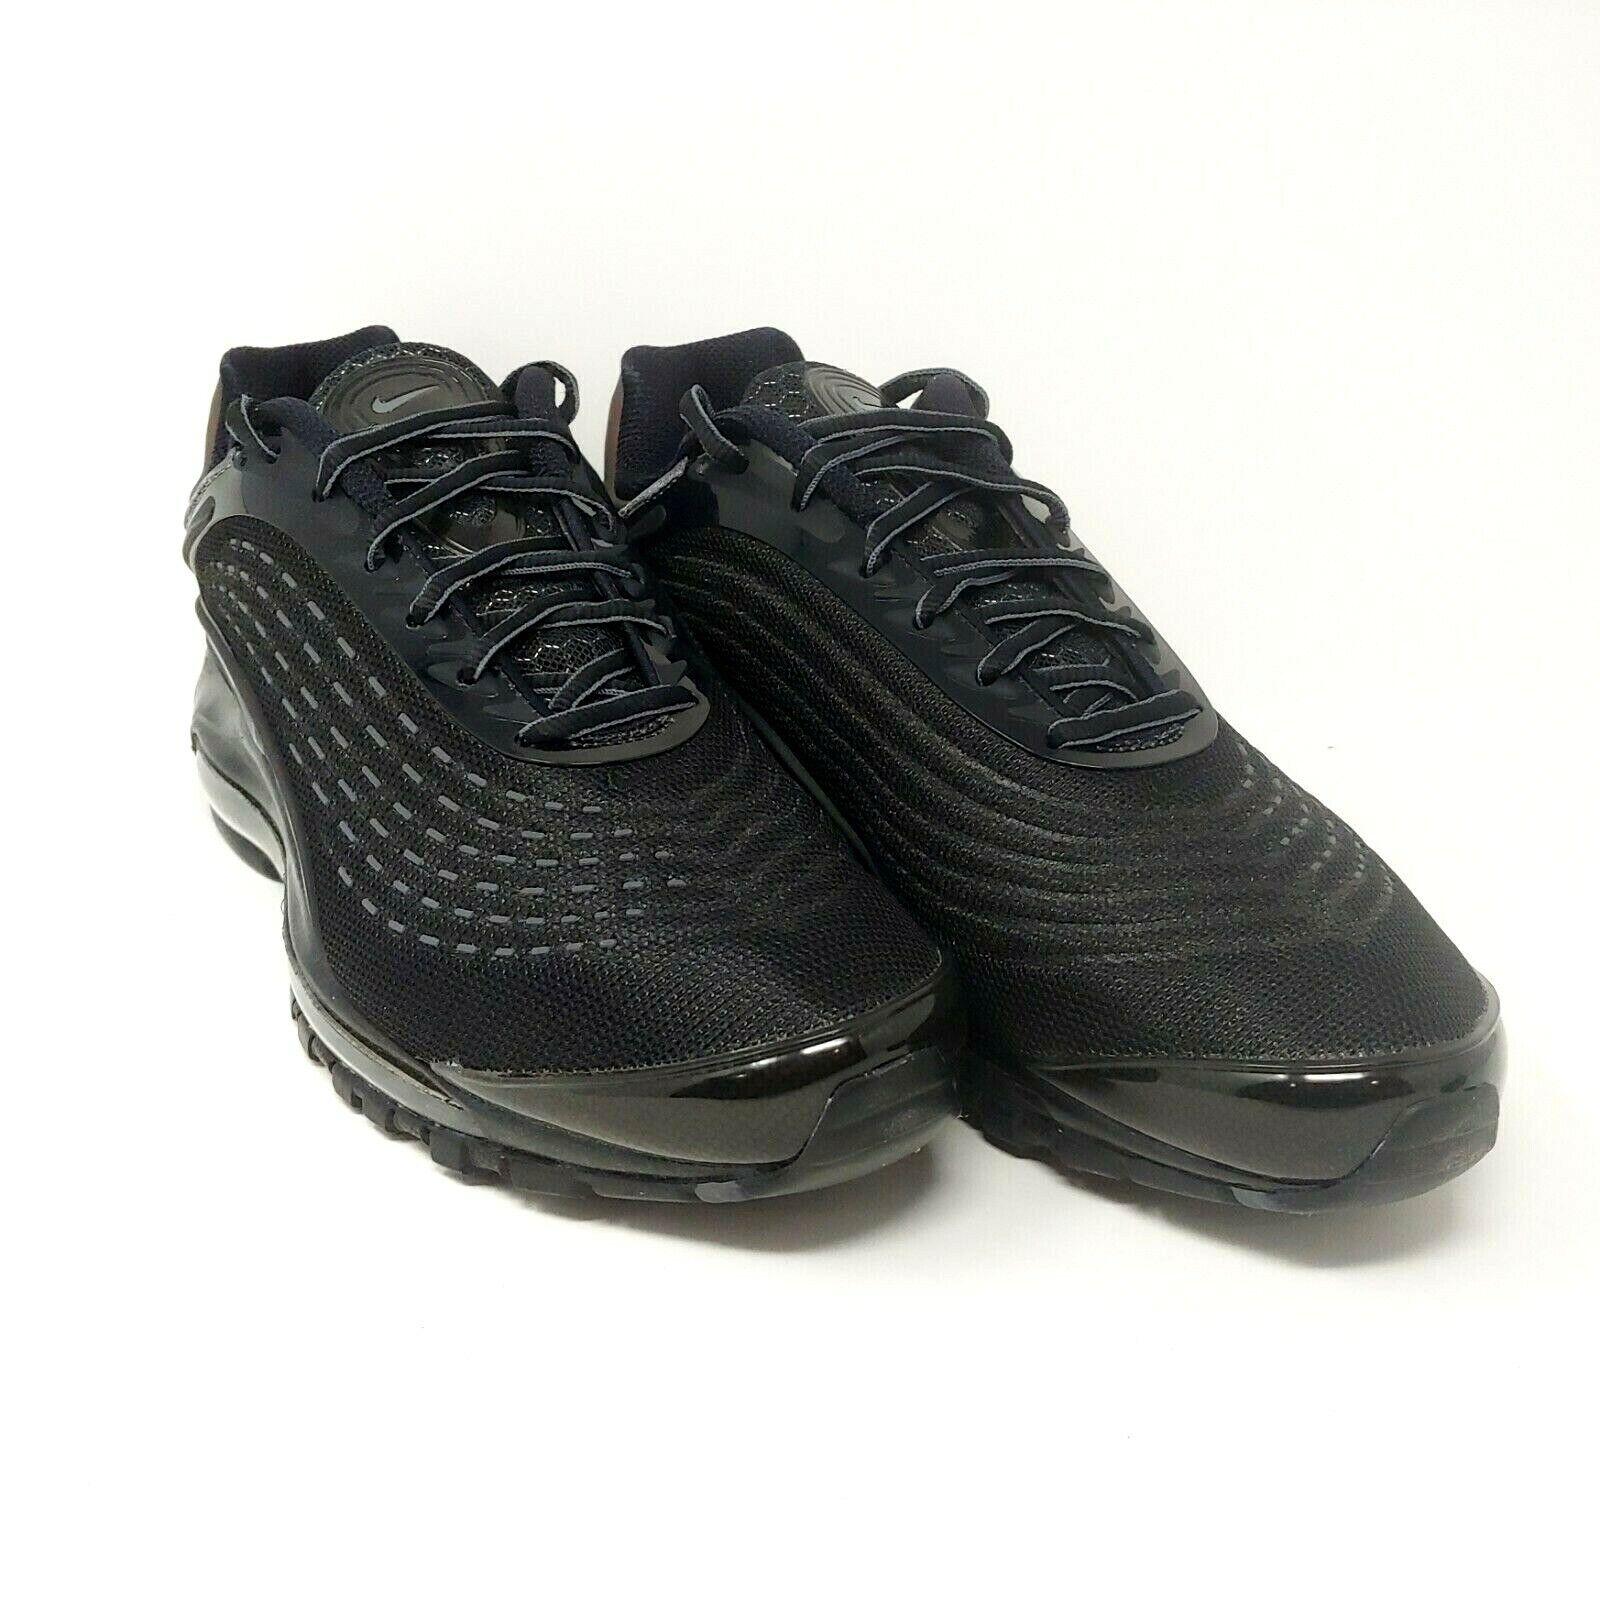 Nike Nike Nike Air Max Deluxe Triple Black Dark Grey Reflective 3M Sneakers Mens Size 10 ef739f